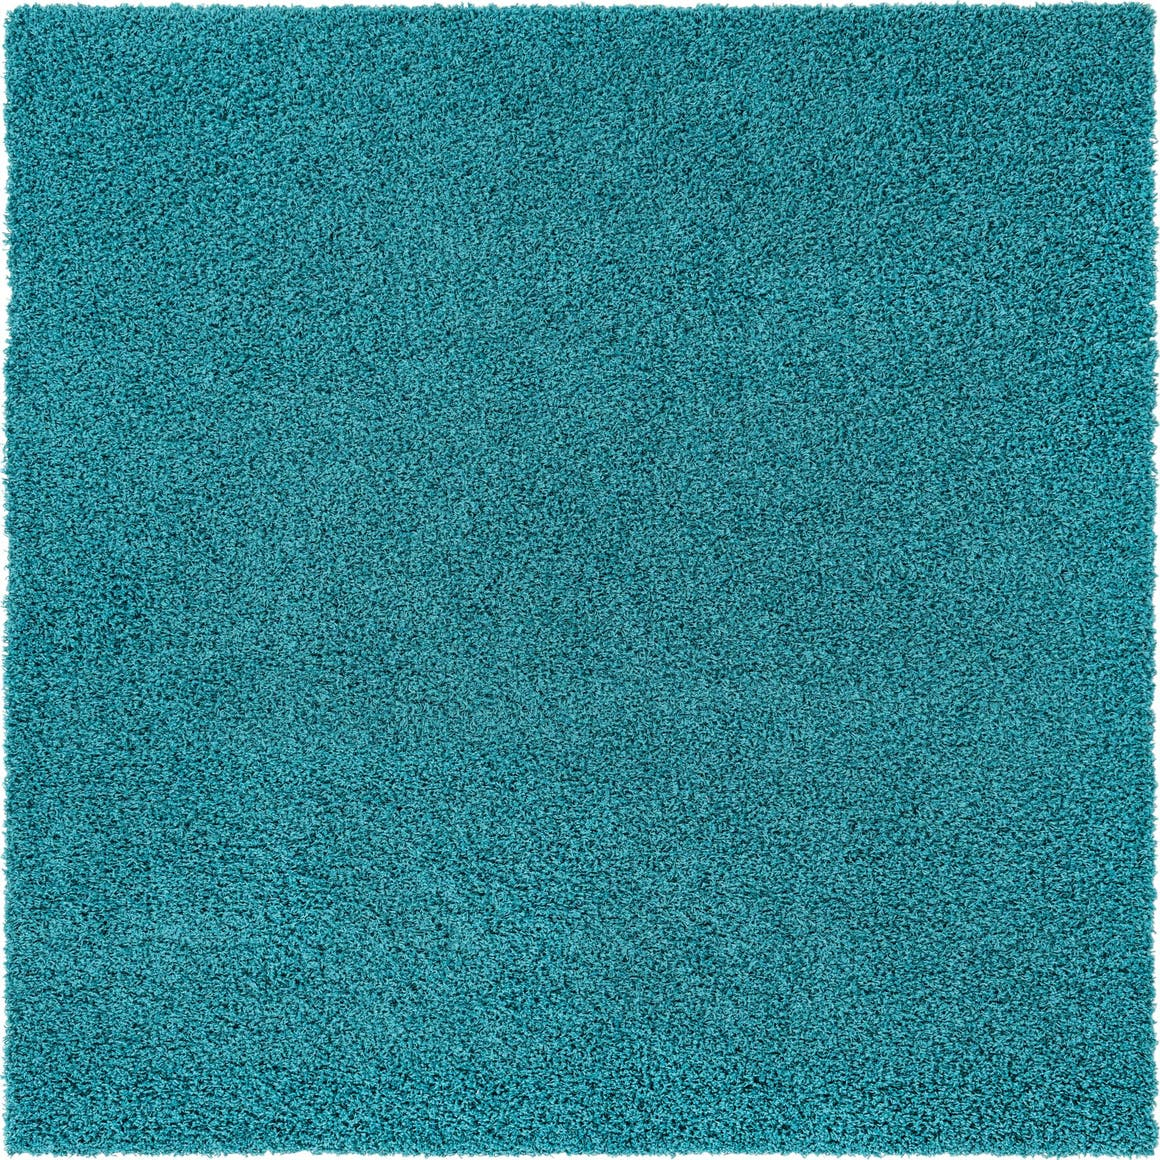 8' x 8' Solid Shag Square Rug main image